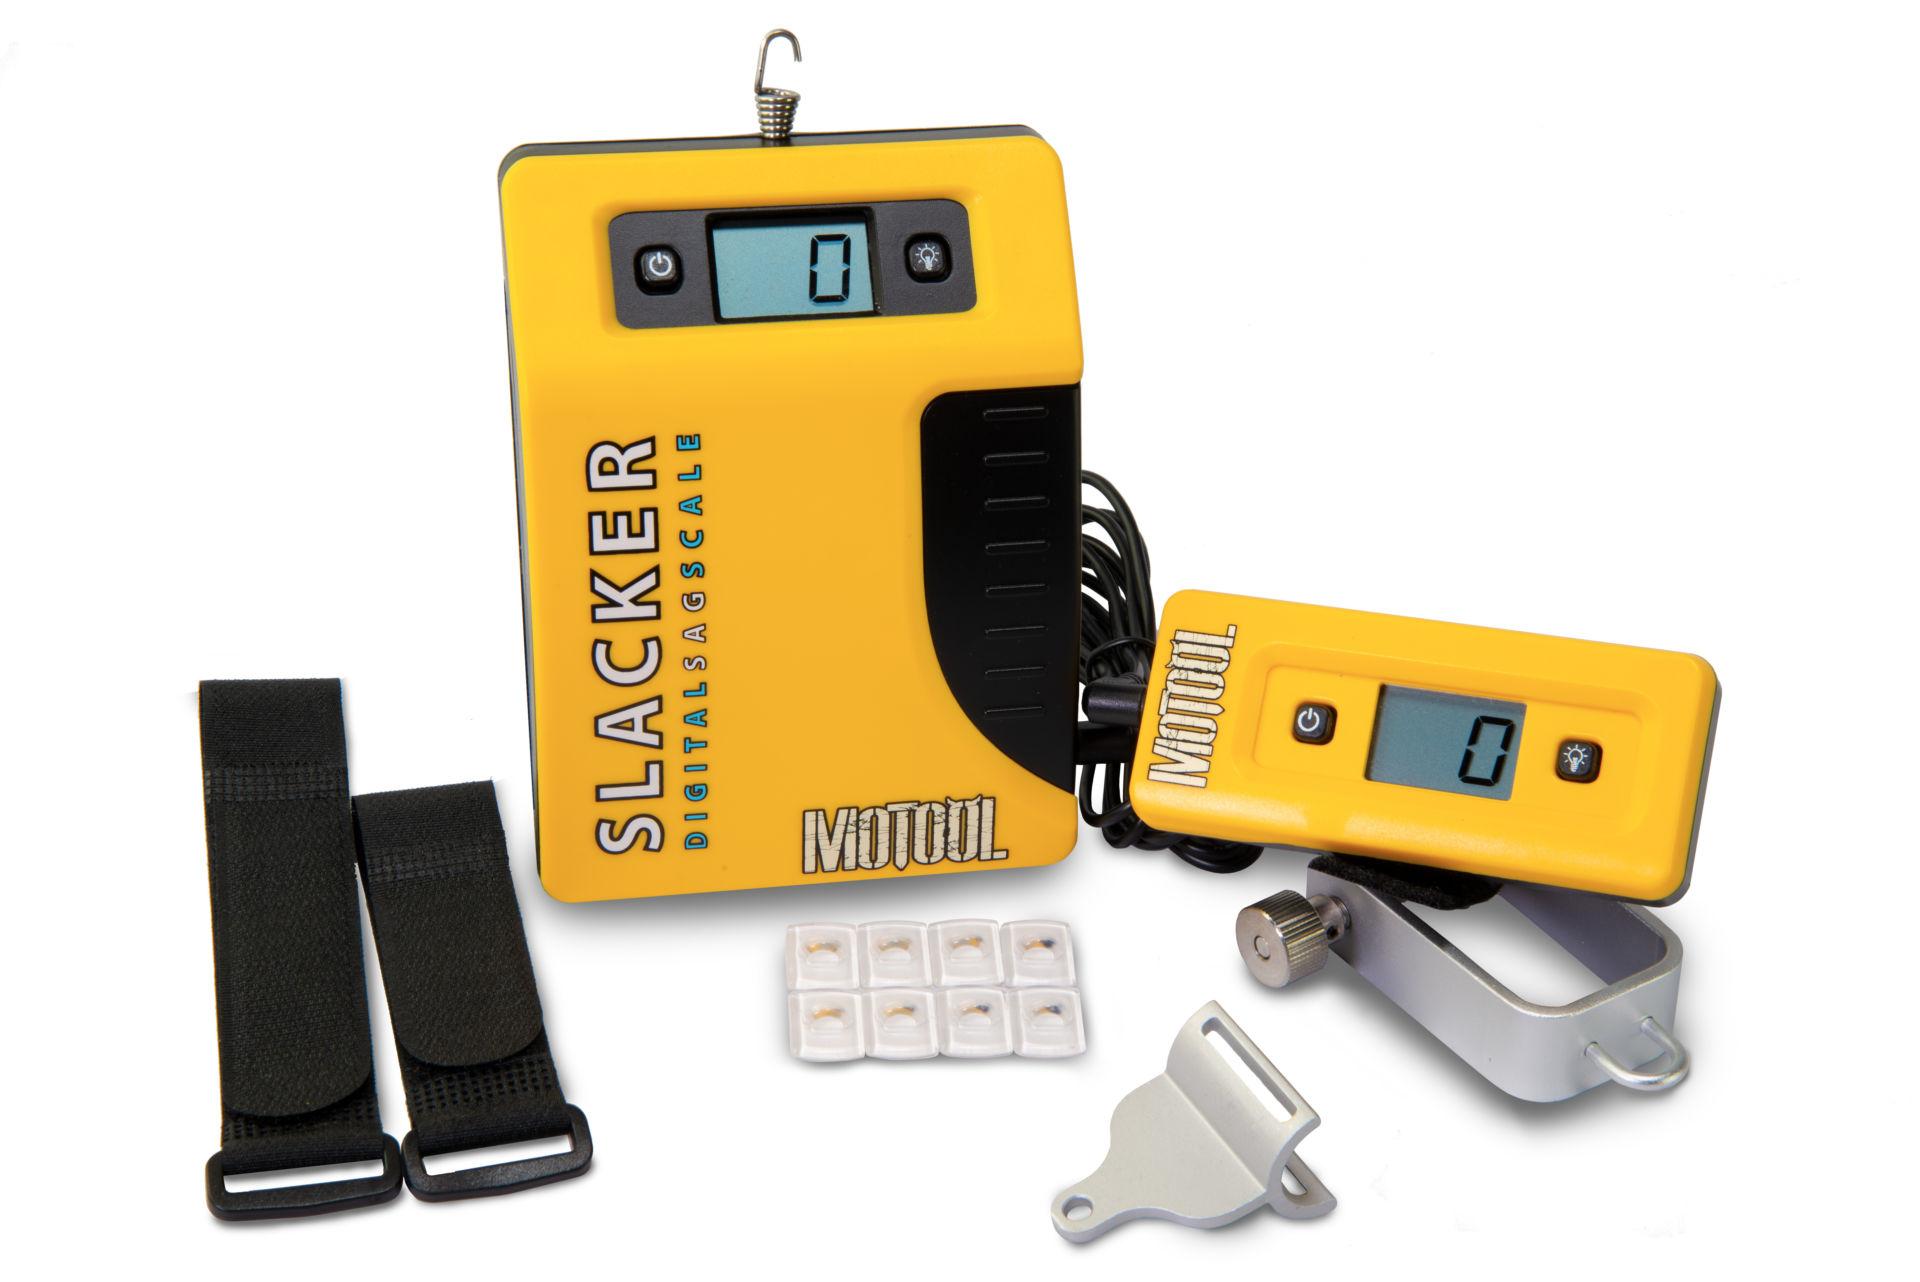 A Motool Slacker sag measuring device. Photo courtesy Motool.